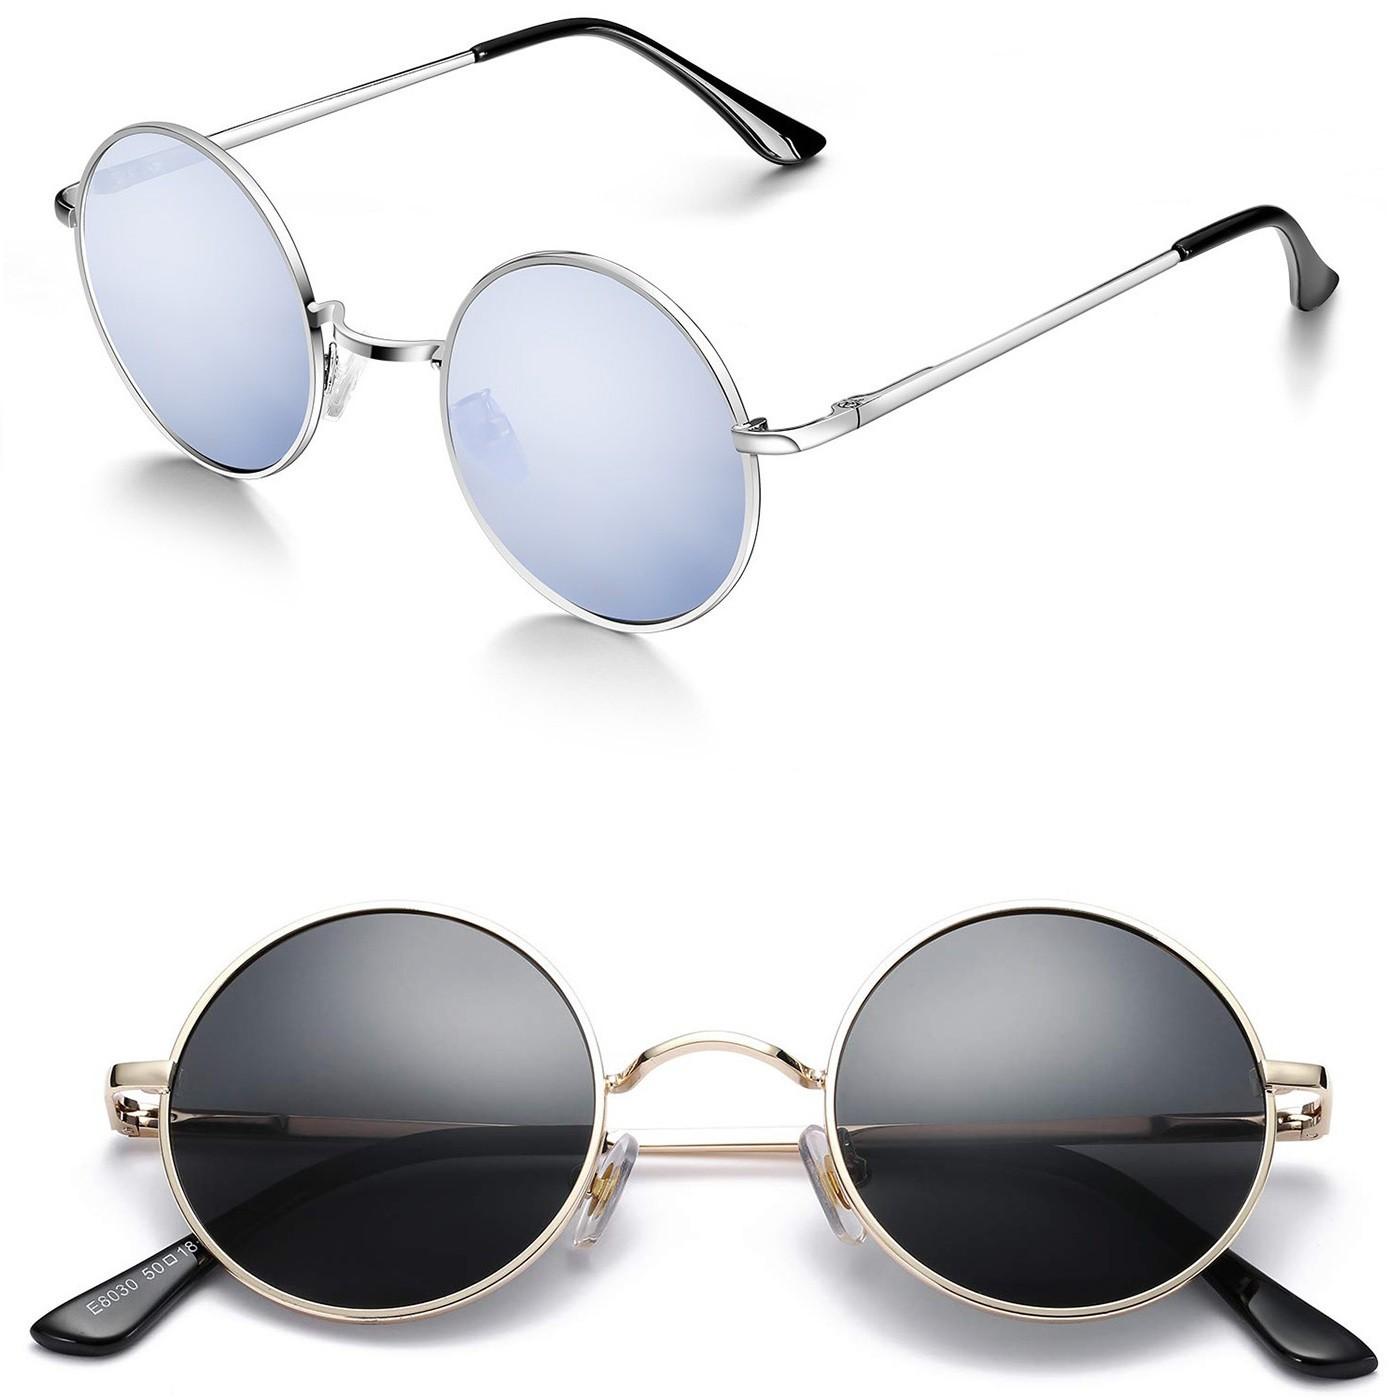 Occhiali da sole ROTONDI Hippie - stile TEASHADES John Lennon - Metallo Leggero VINTAGE uomo donna - Colore : GOLD / Blu Fumè